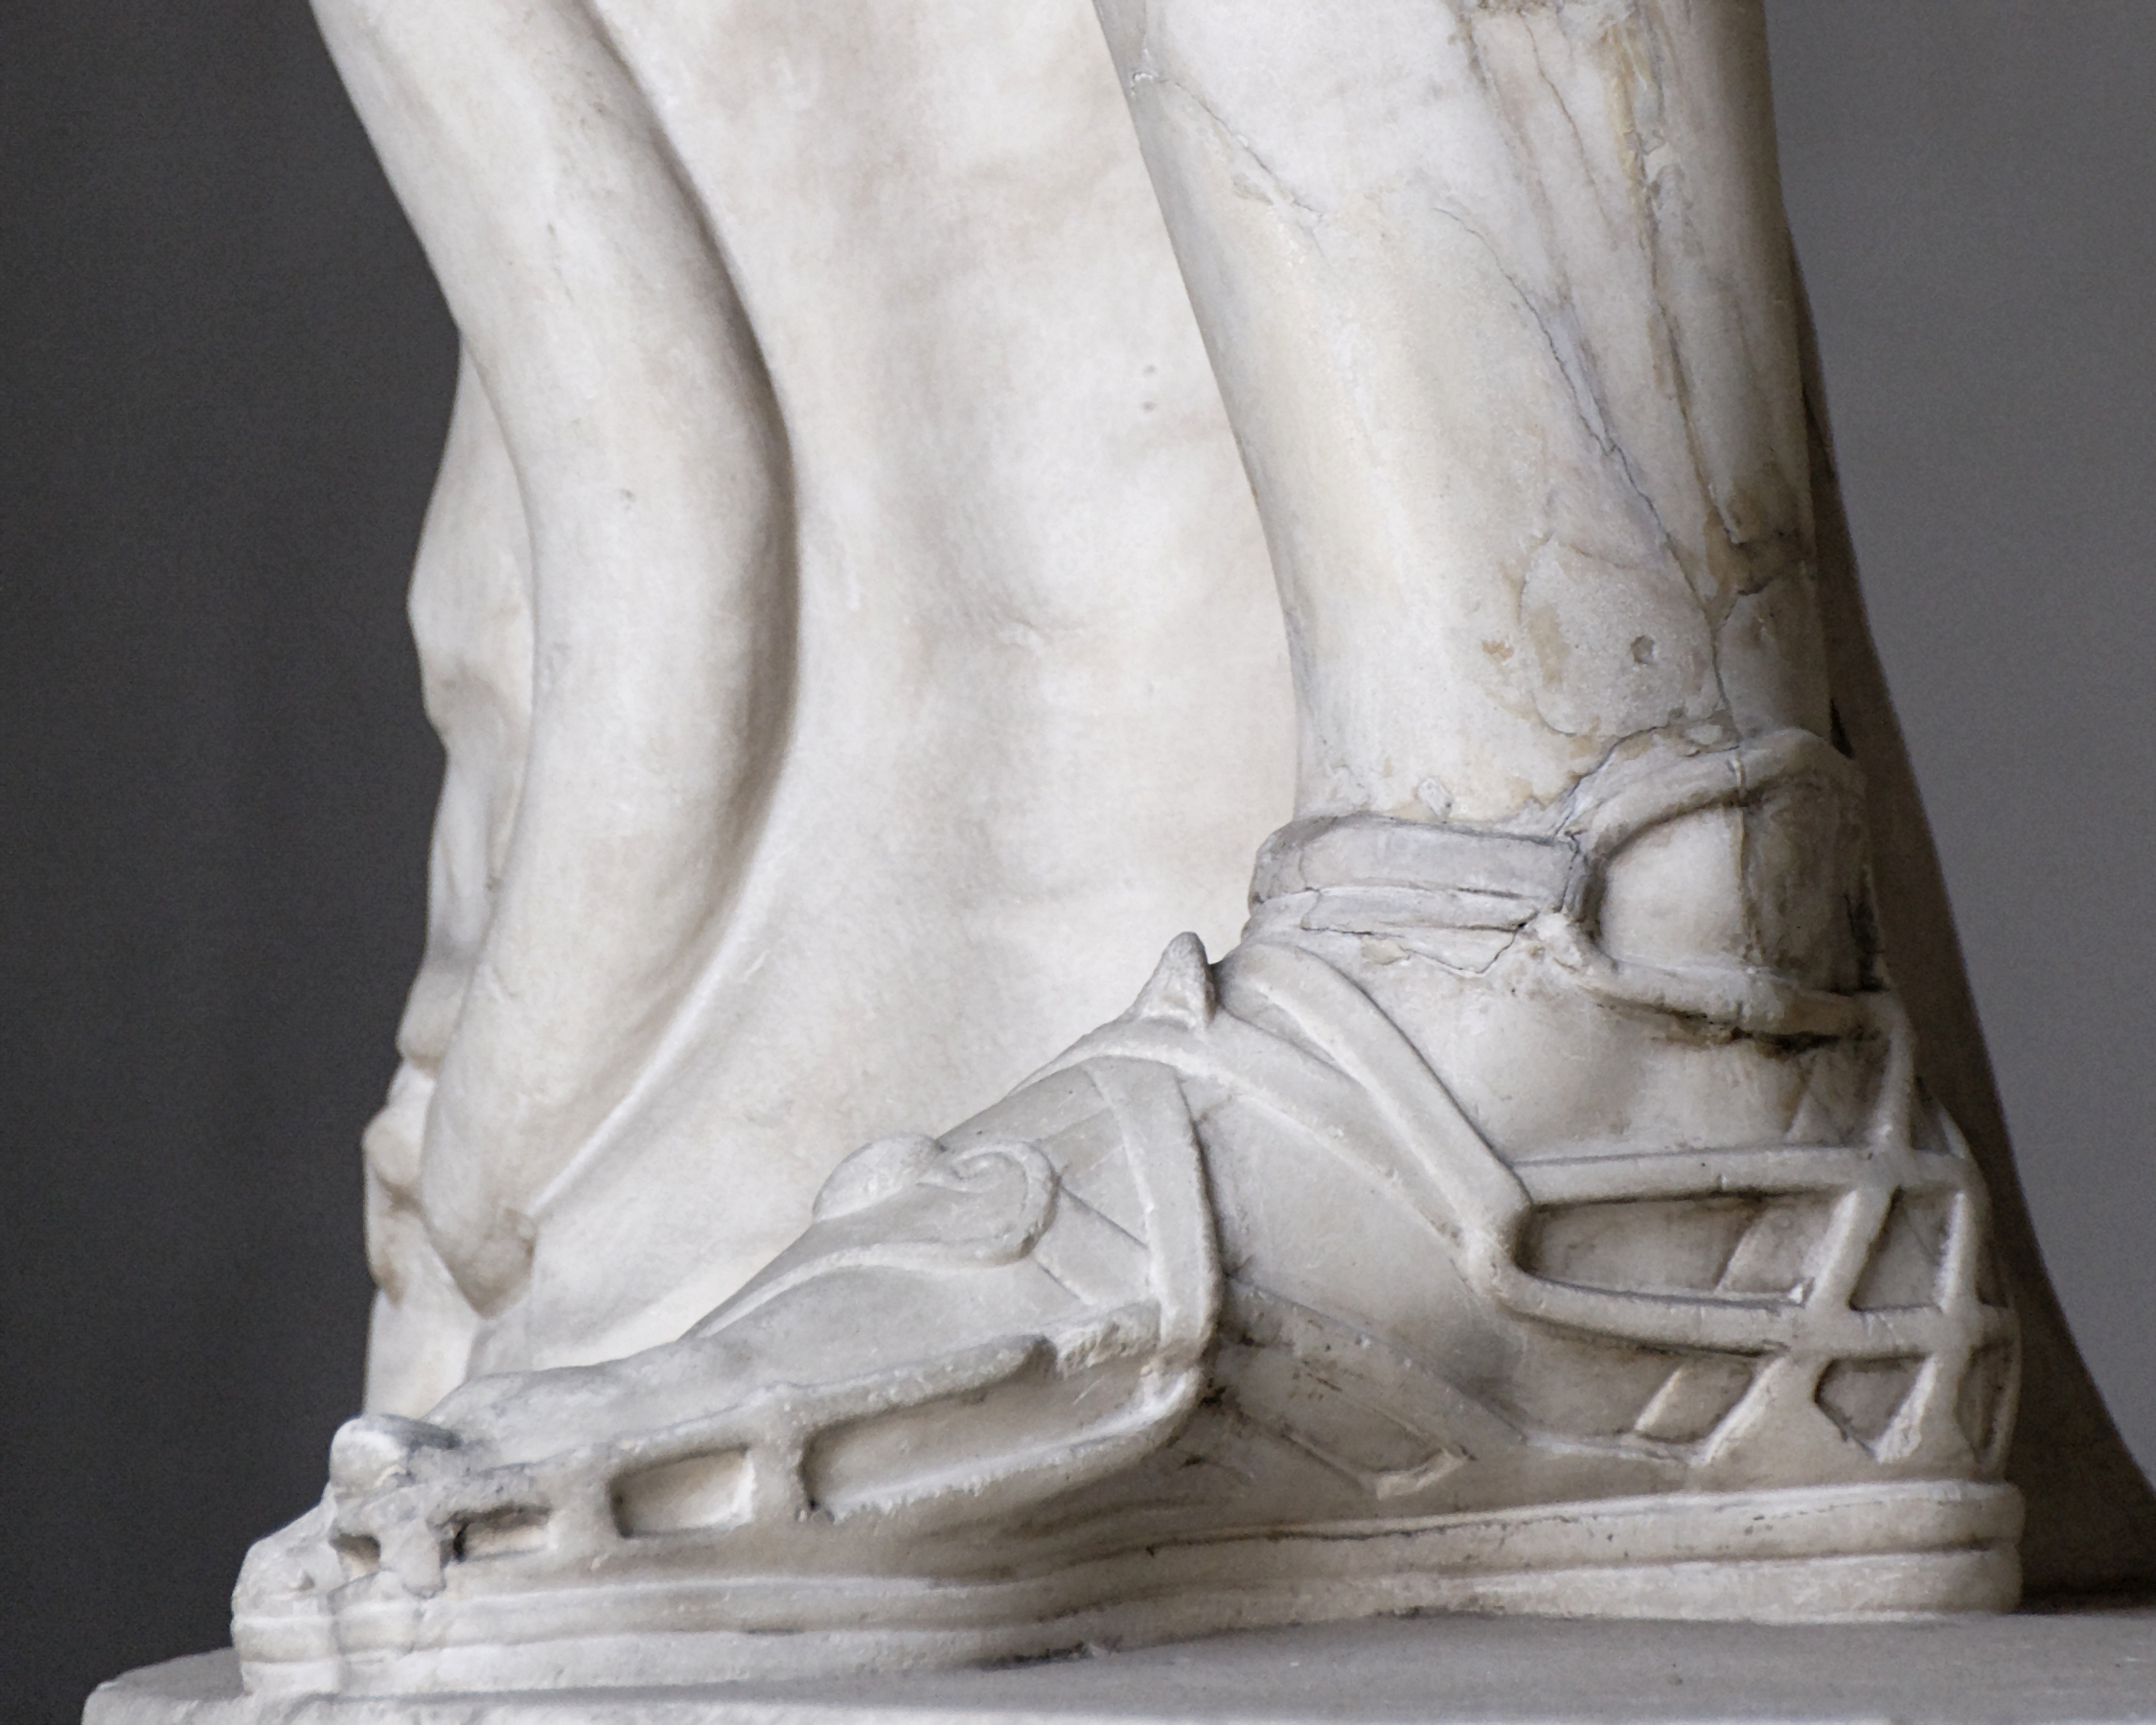 Roman sandal on Belvedere Apollo by Pio Clementino